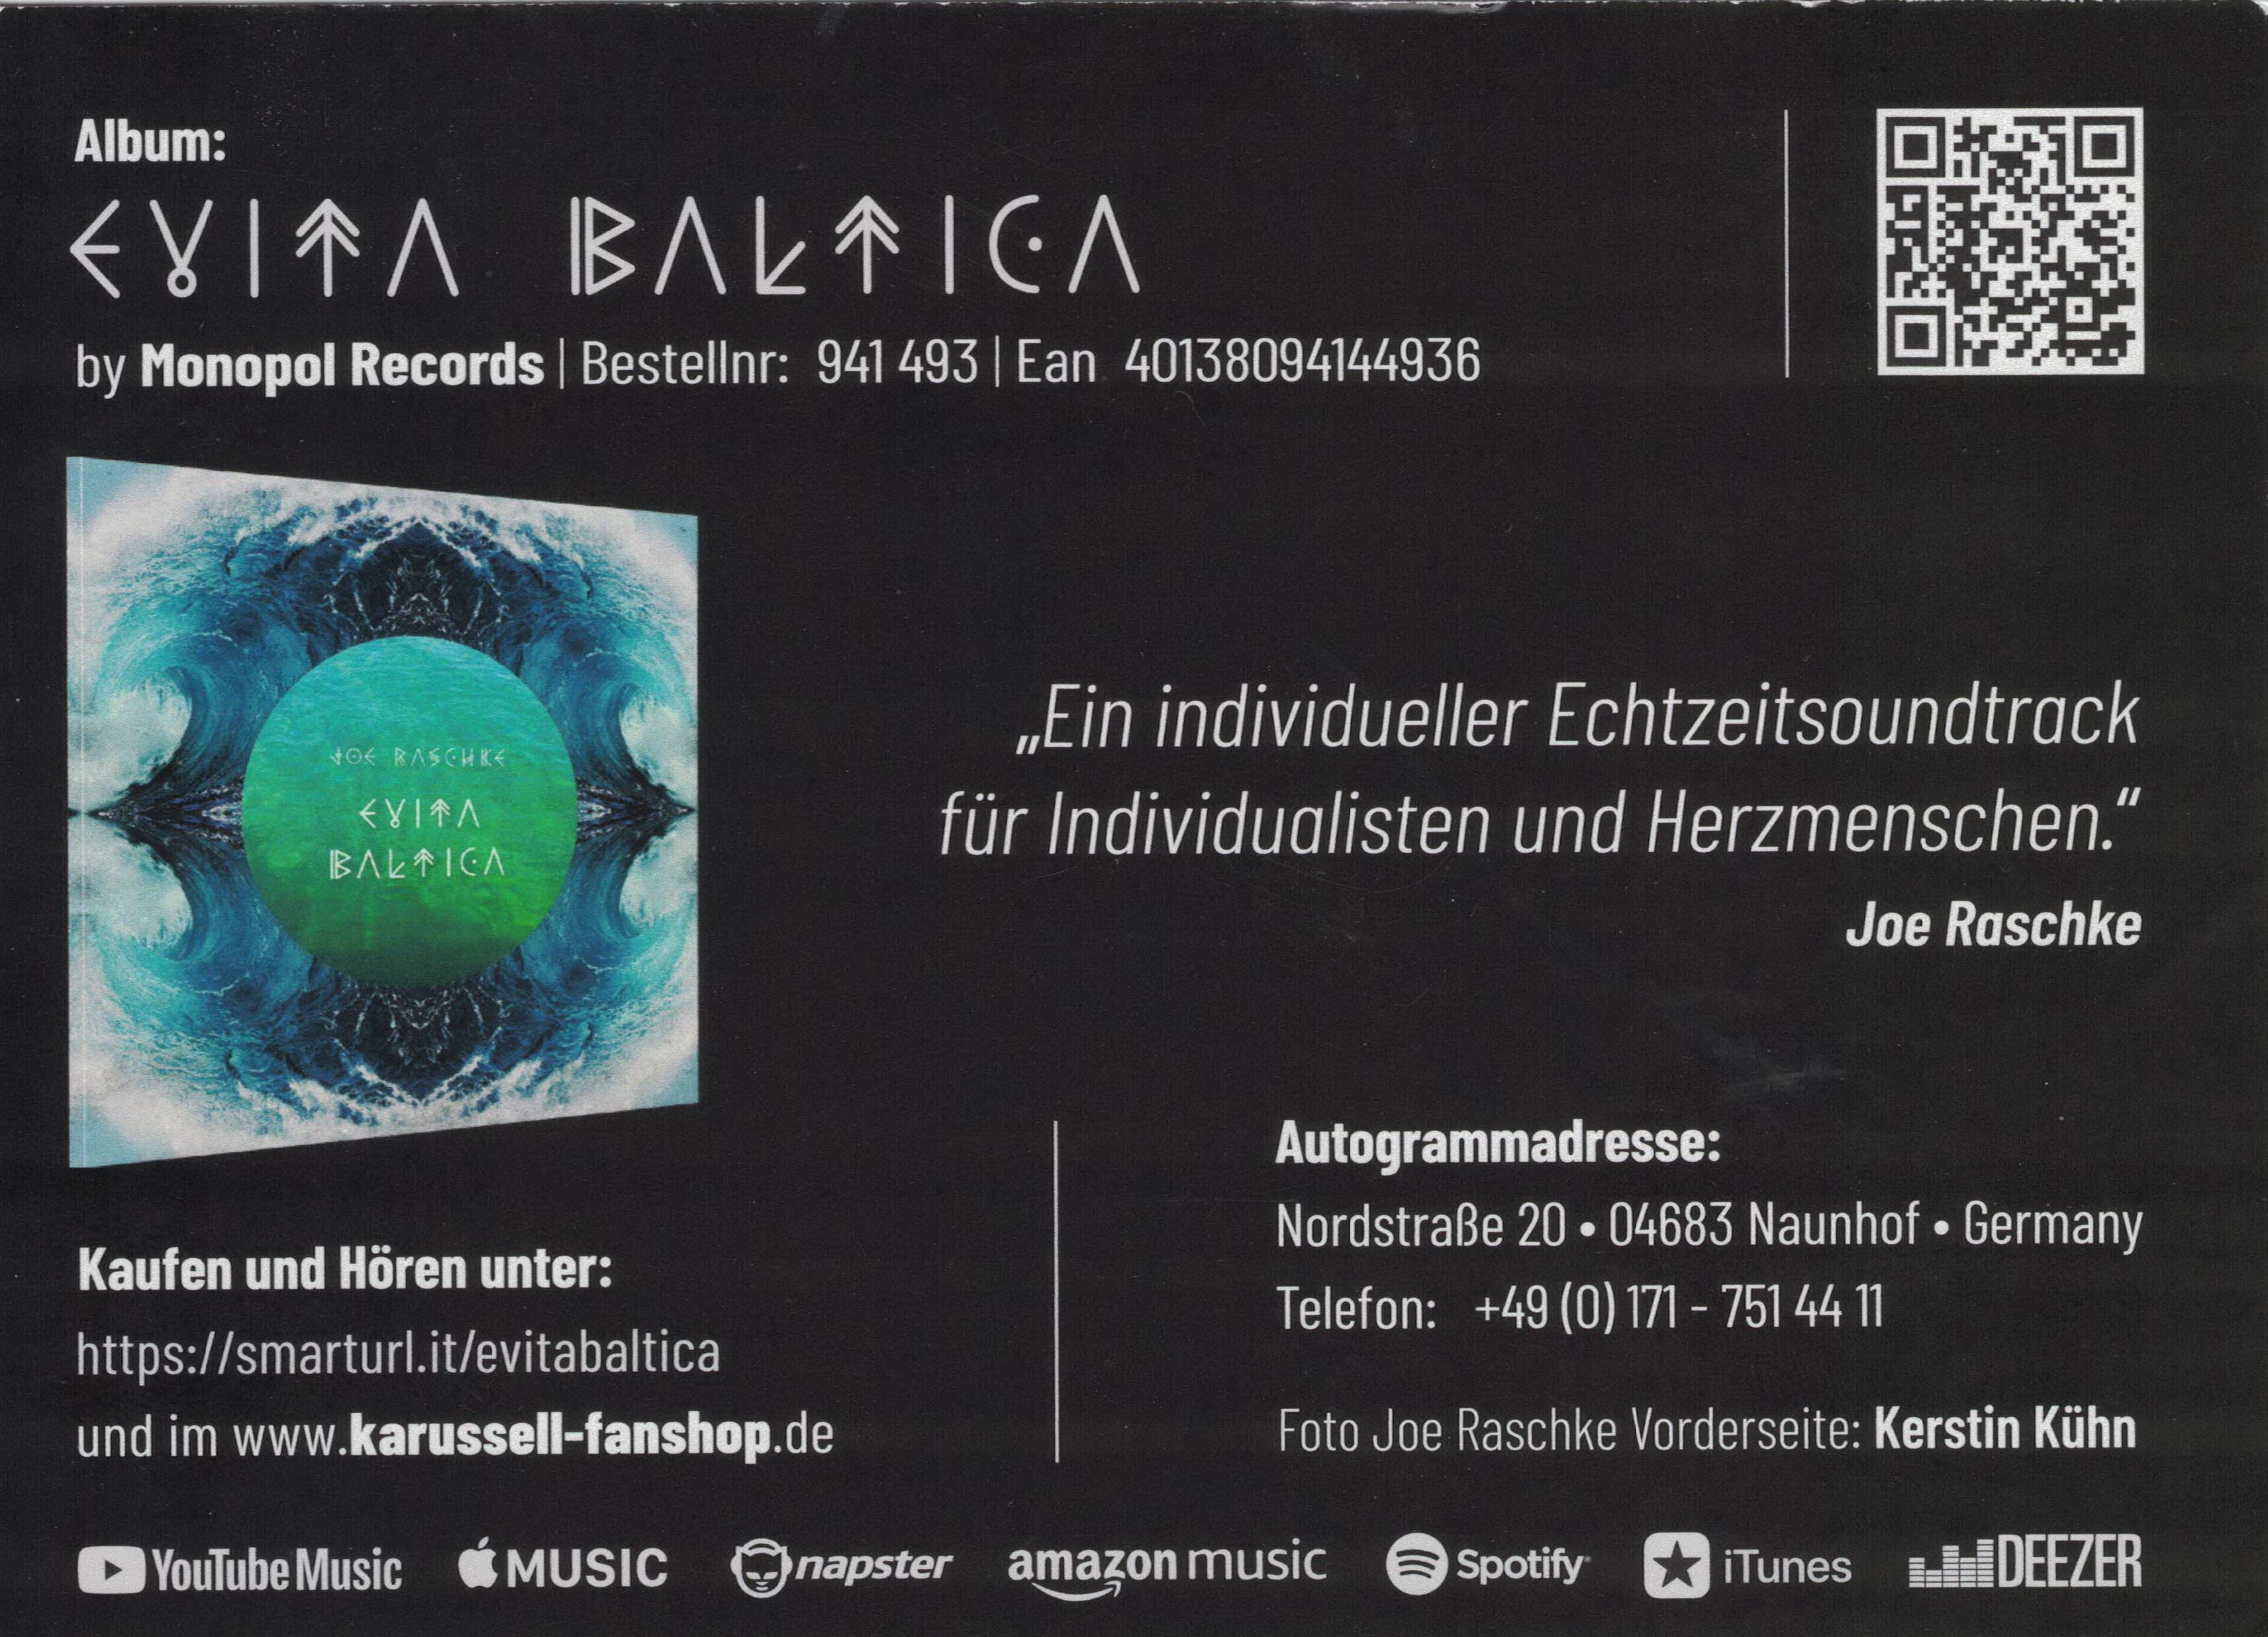 Autogrammkarte_Joe_Raschke_2021_Evita_Baltica_RS